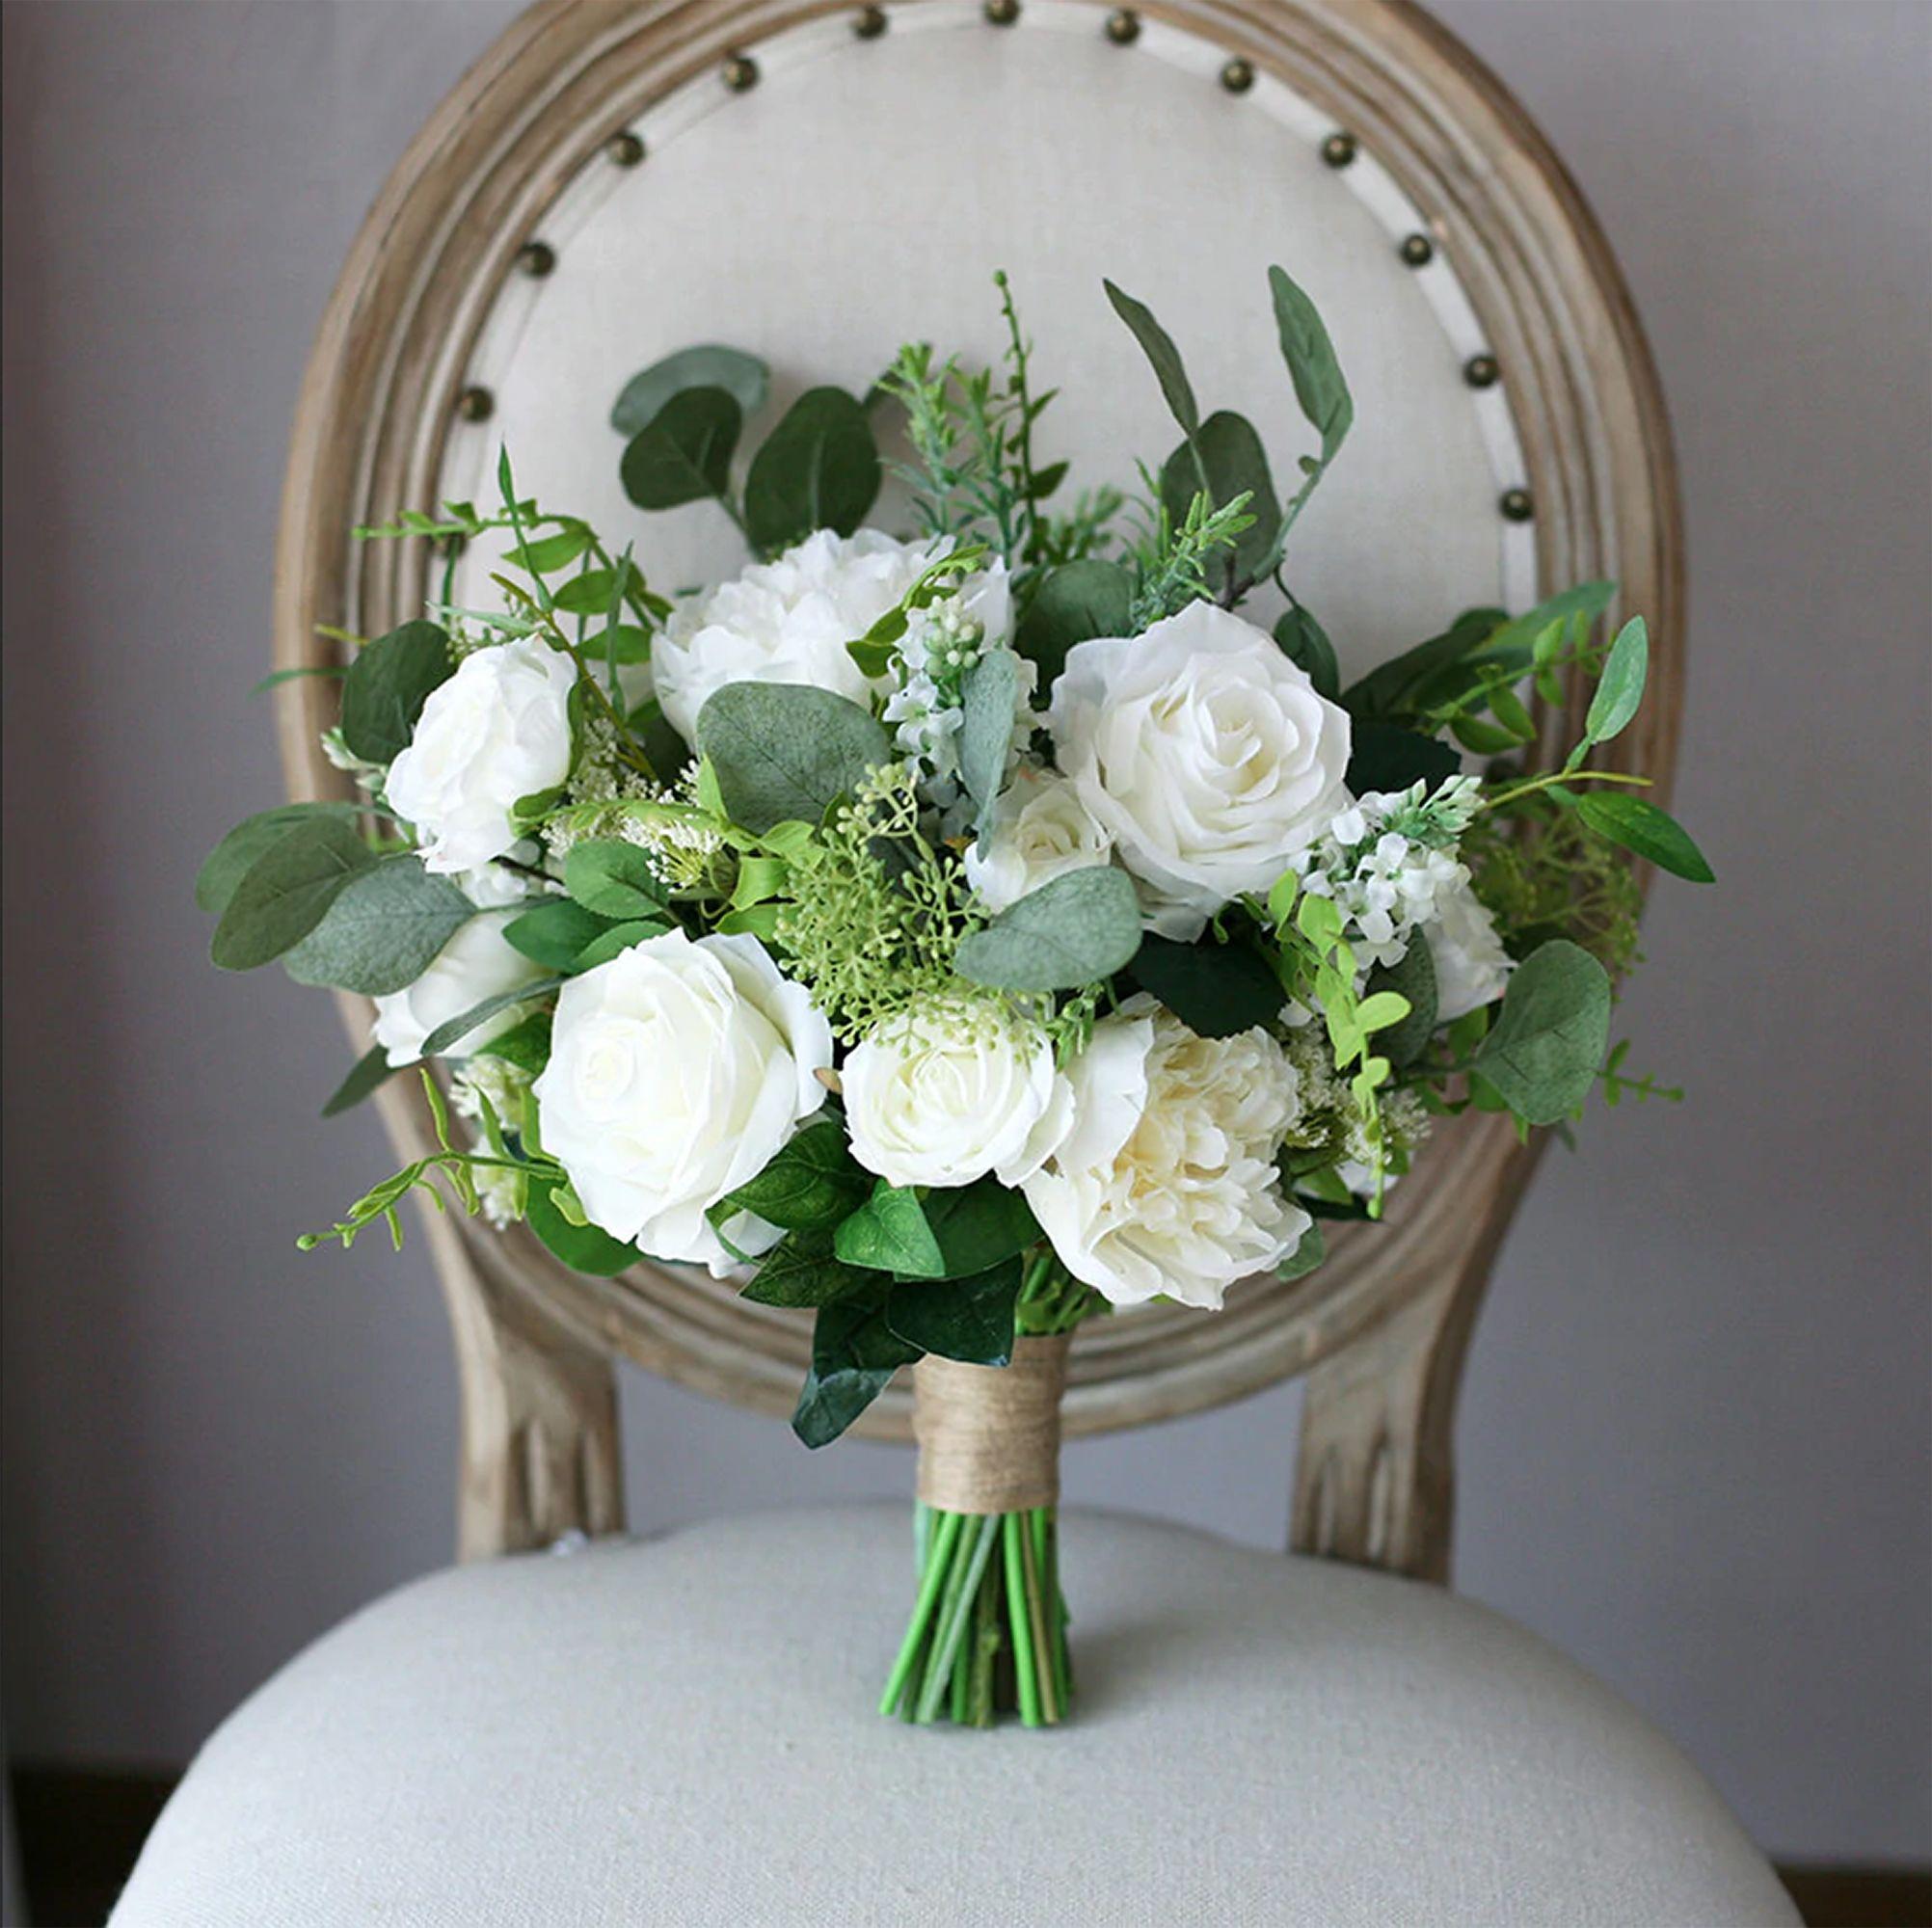 White Rose & Peony Bridal Bouquet, Greenery Wedding